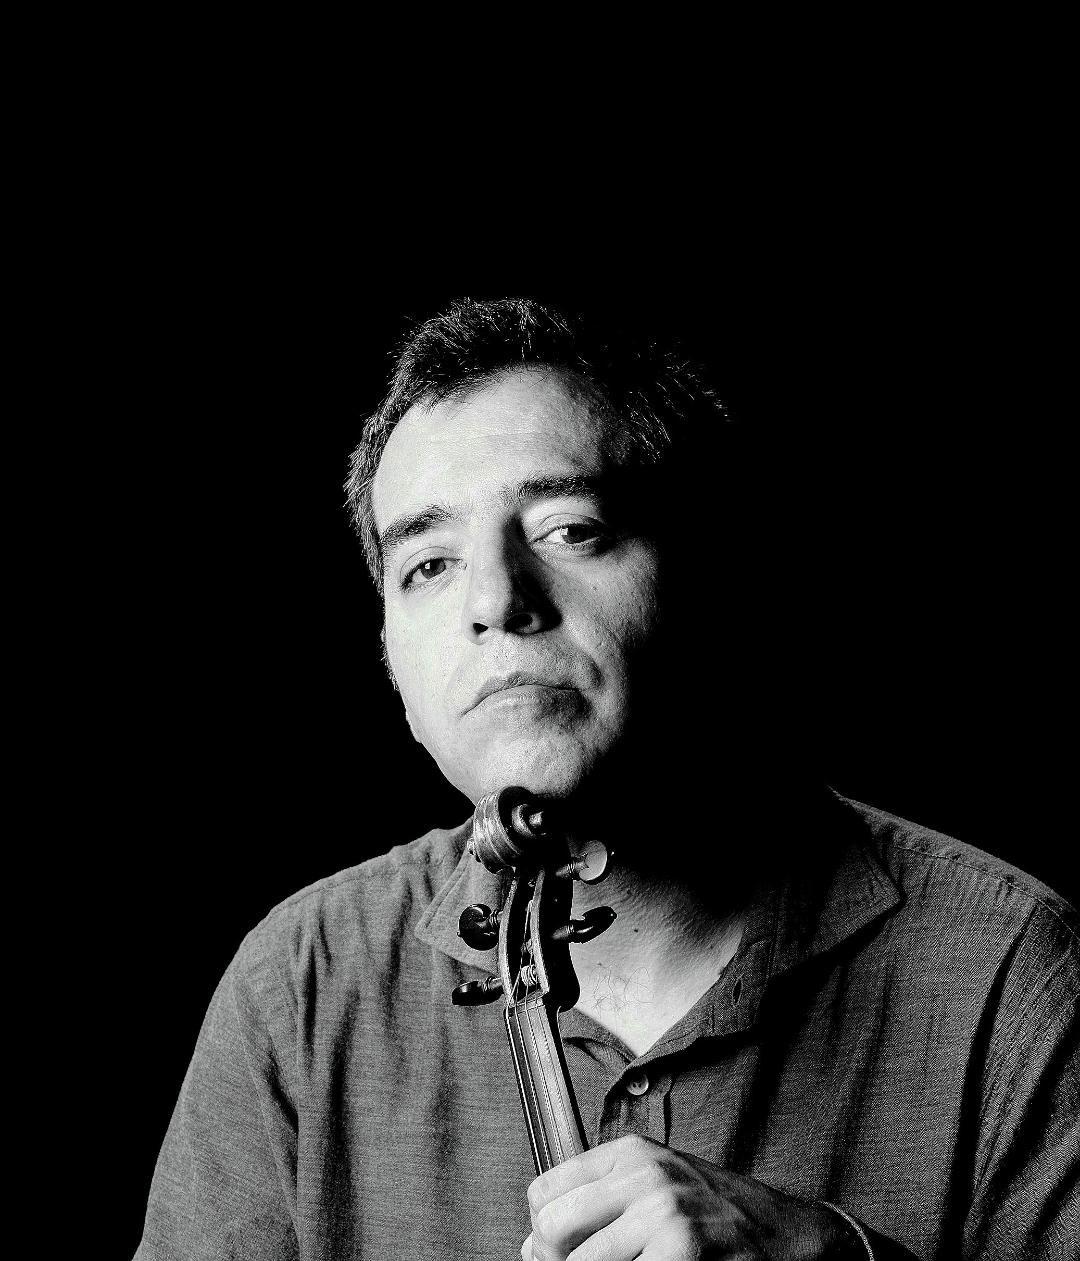 Juan Luis Gallego